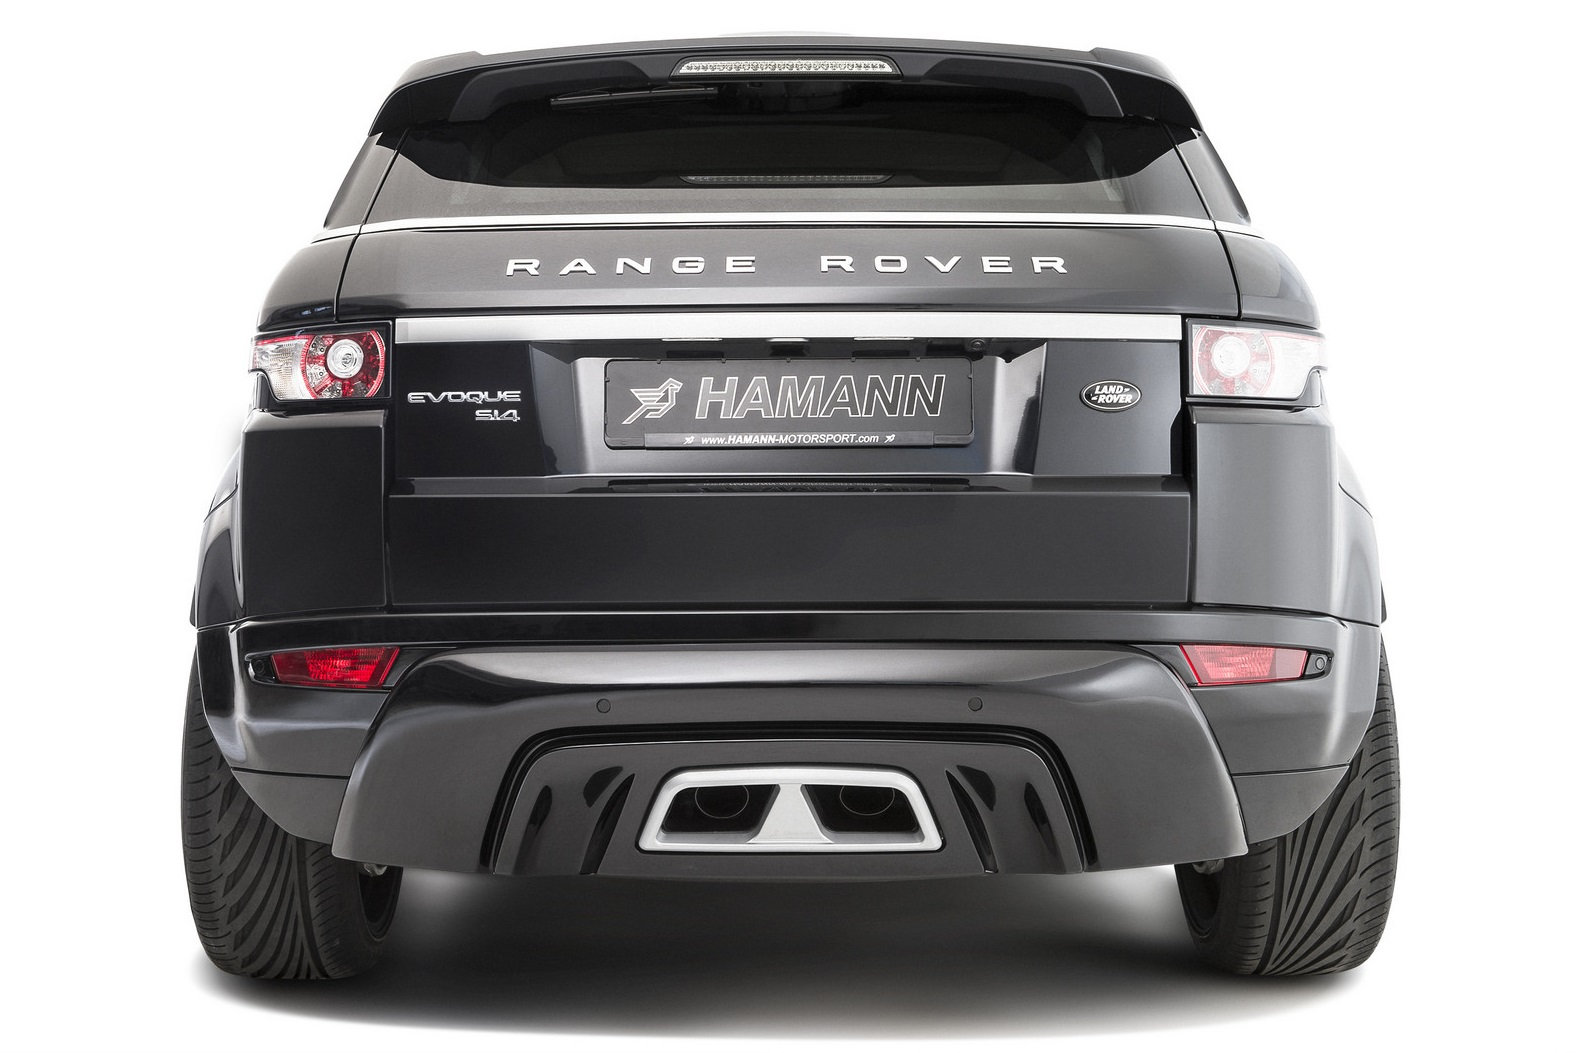 Land Rover Evoque Convertible >> Range Rover Evoque tuning e cerchi in lega | Ruotequipe Motorsport